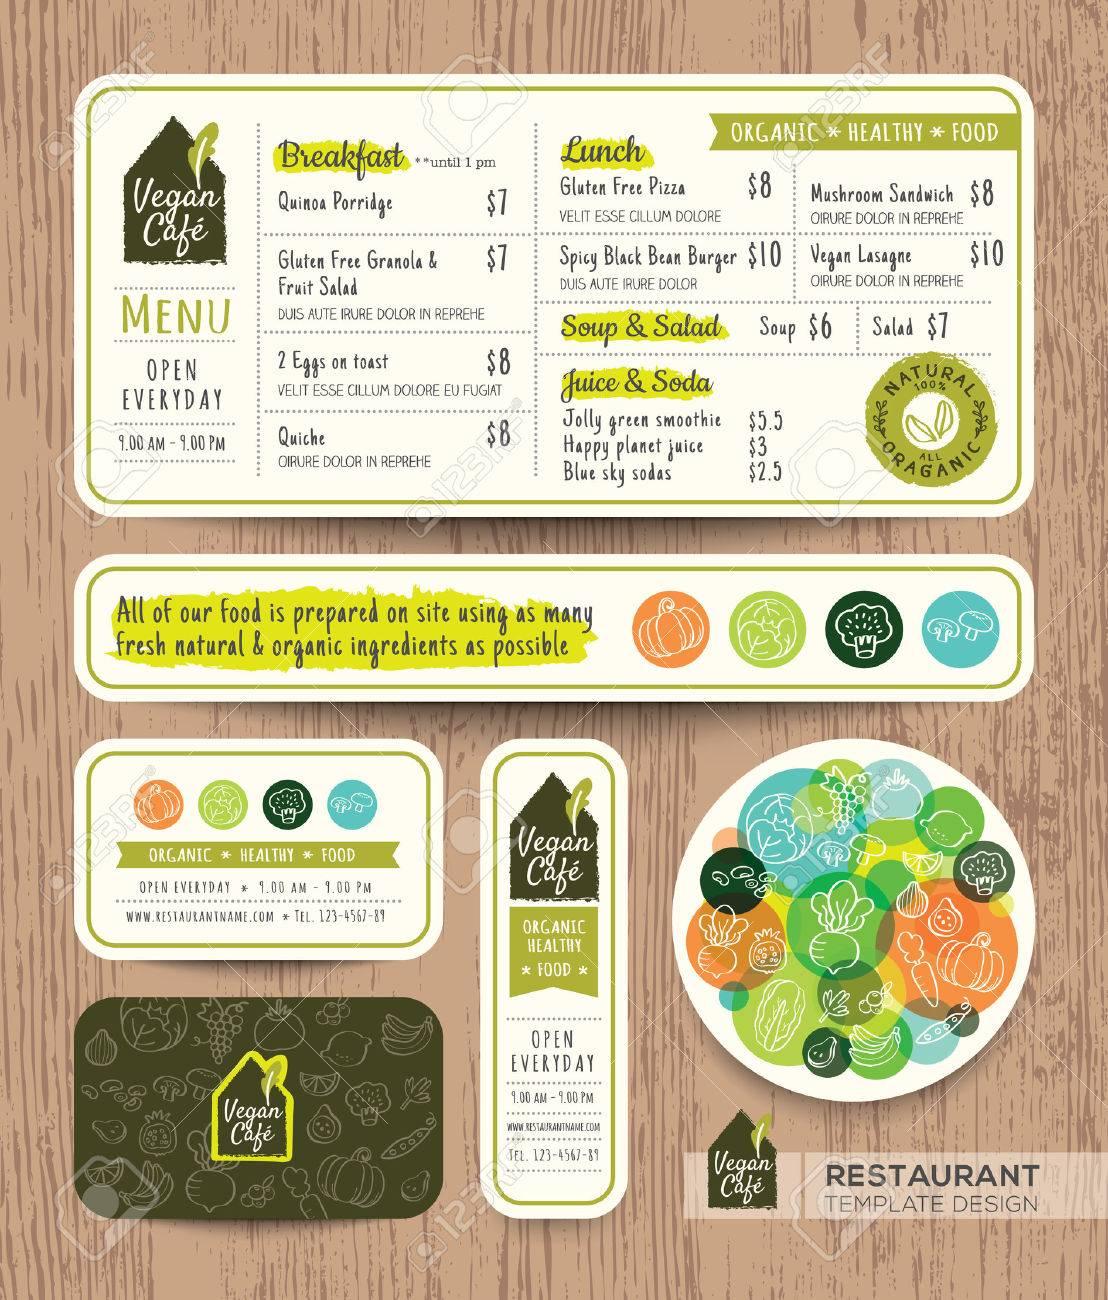 Vegetarian and vegan healthy restaurant cafe set menu graphic design template layout - 52125849